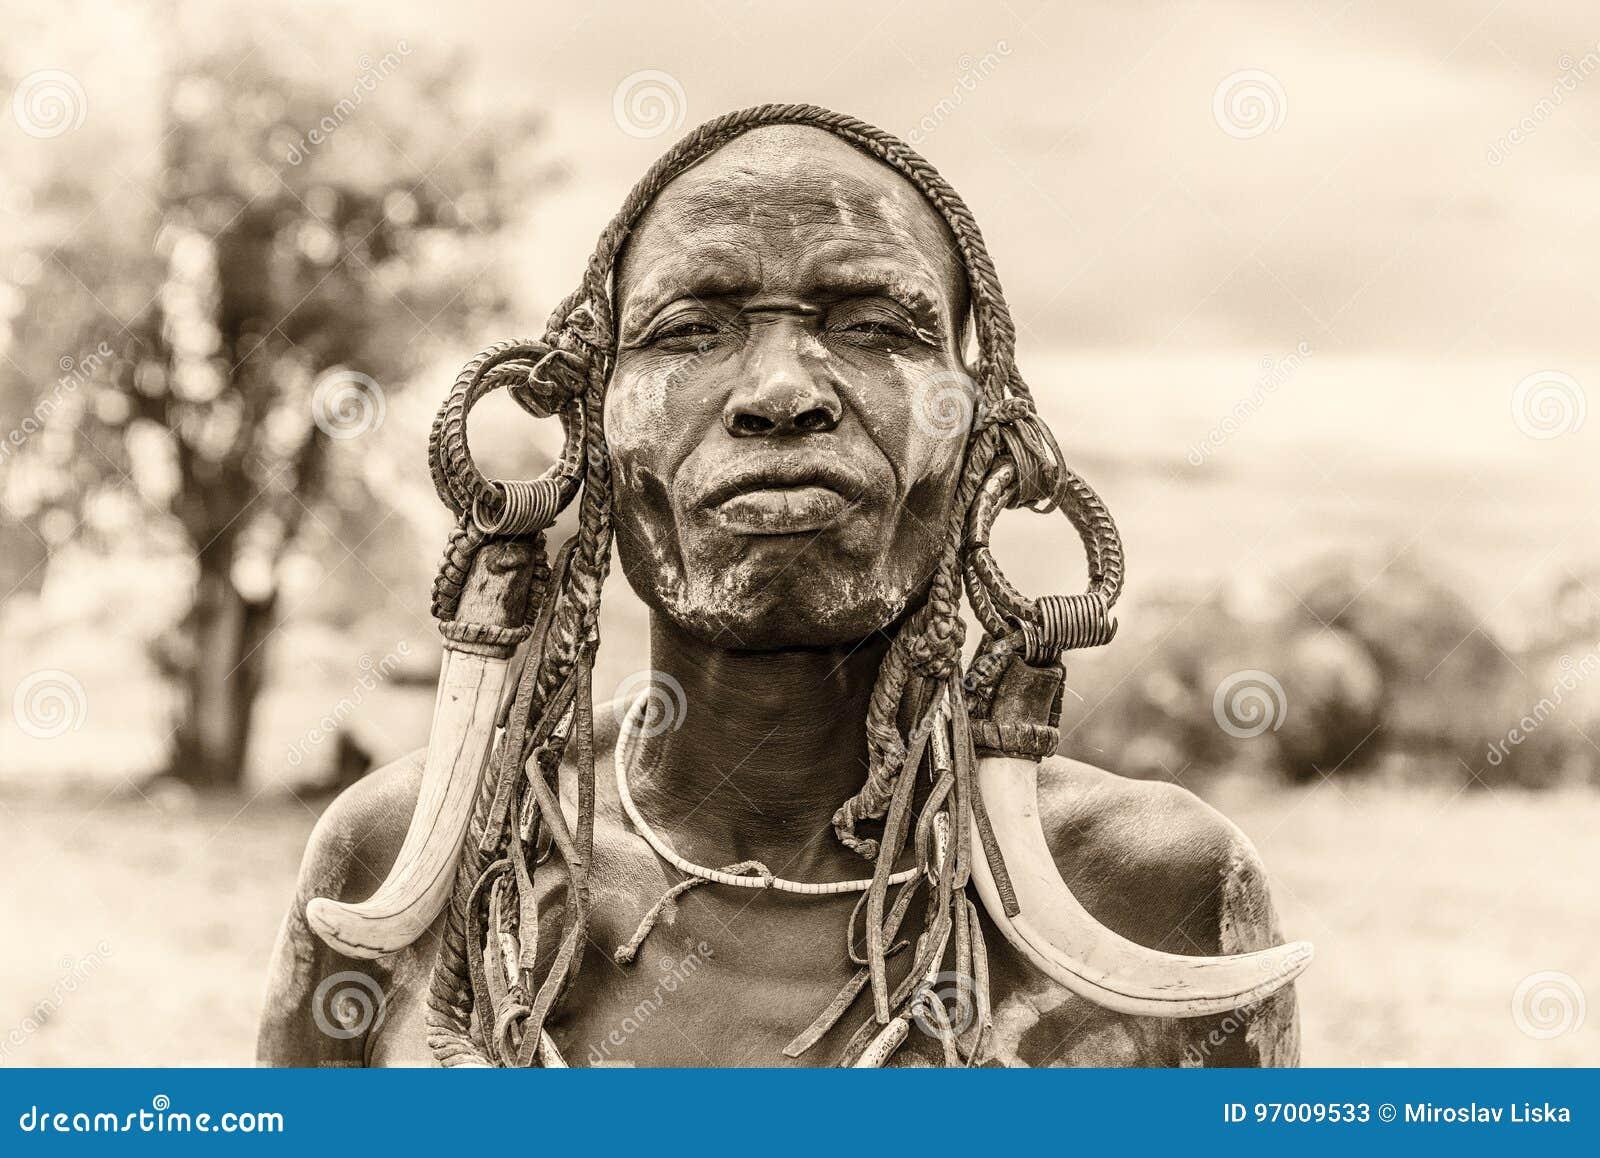 Guerreiro do tribo africano Mursi, Etiópia